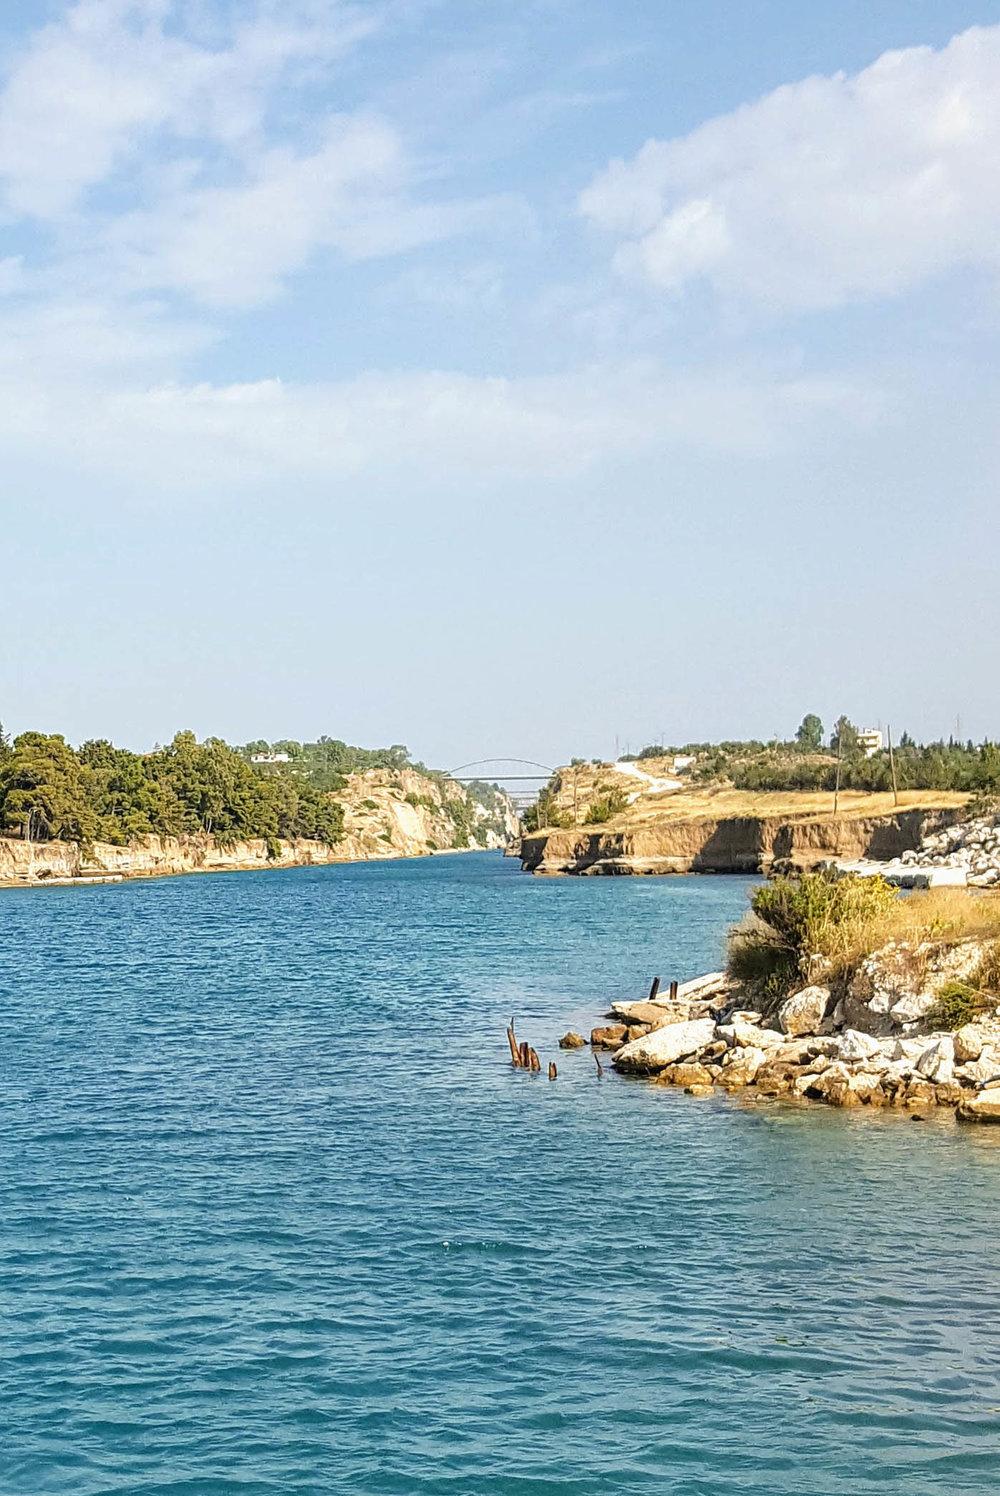 Corinth bridge and diolkos.jpg